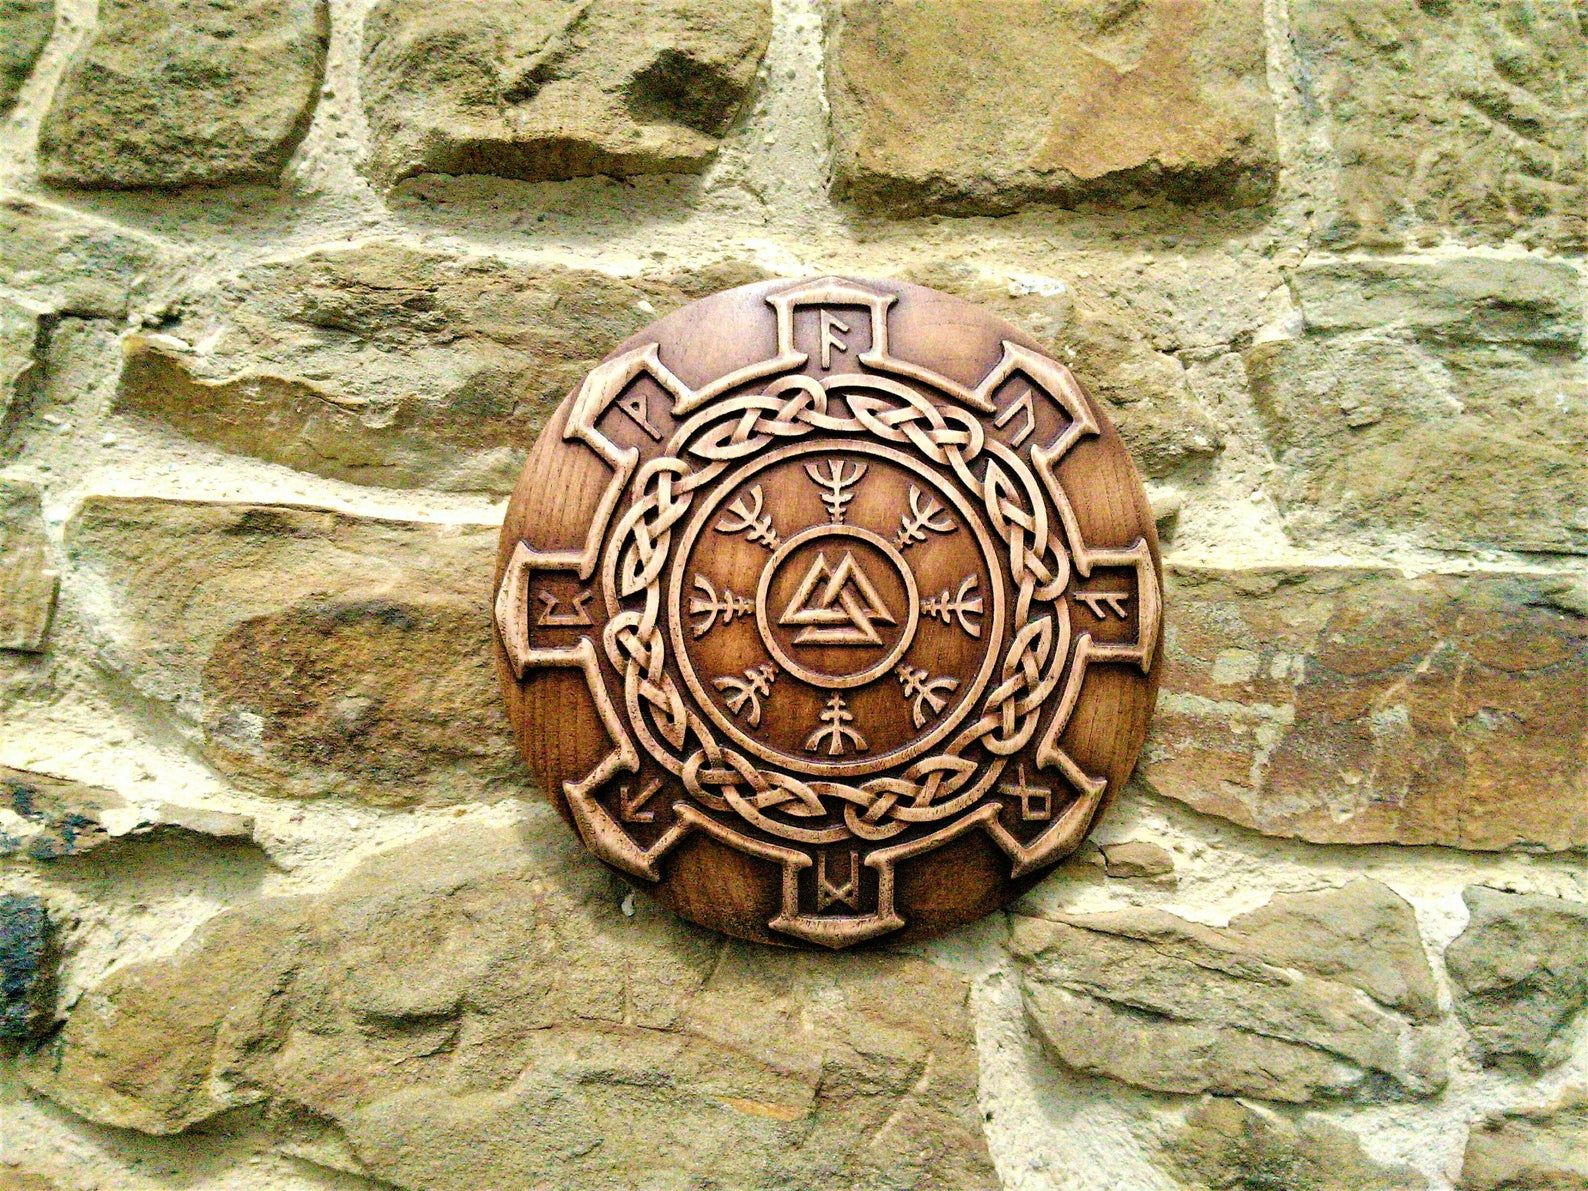 Walknut Viking Symbol Plaques Home Decor Art Norse Thor Odin Wood Picture Pagan Gods Carving Heathen Asatru Celtic Norse Rune Wall Hanging